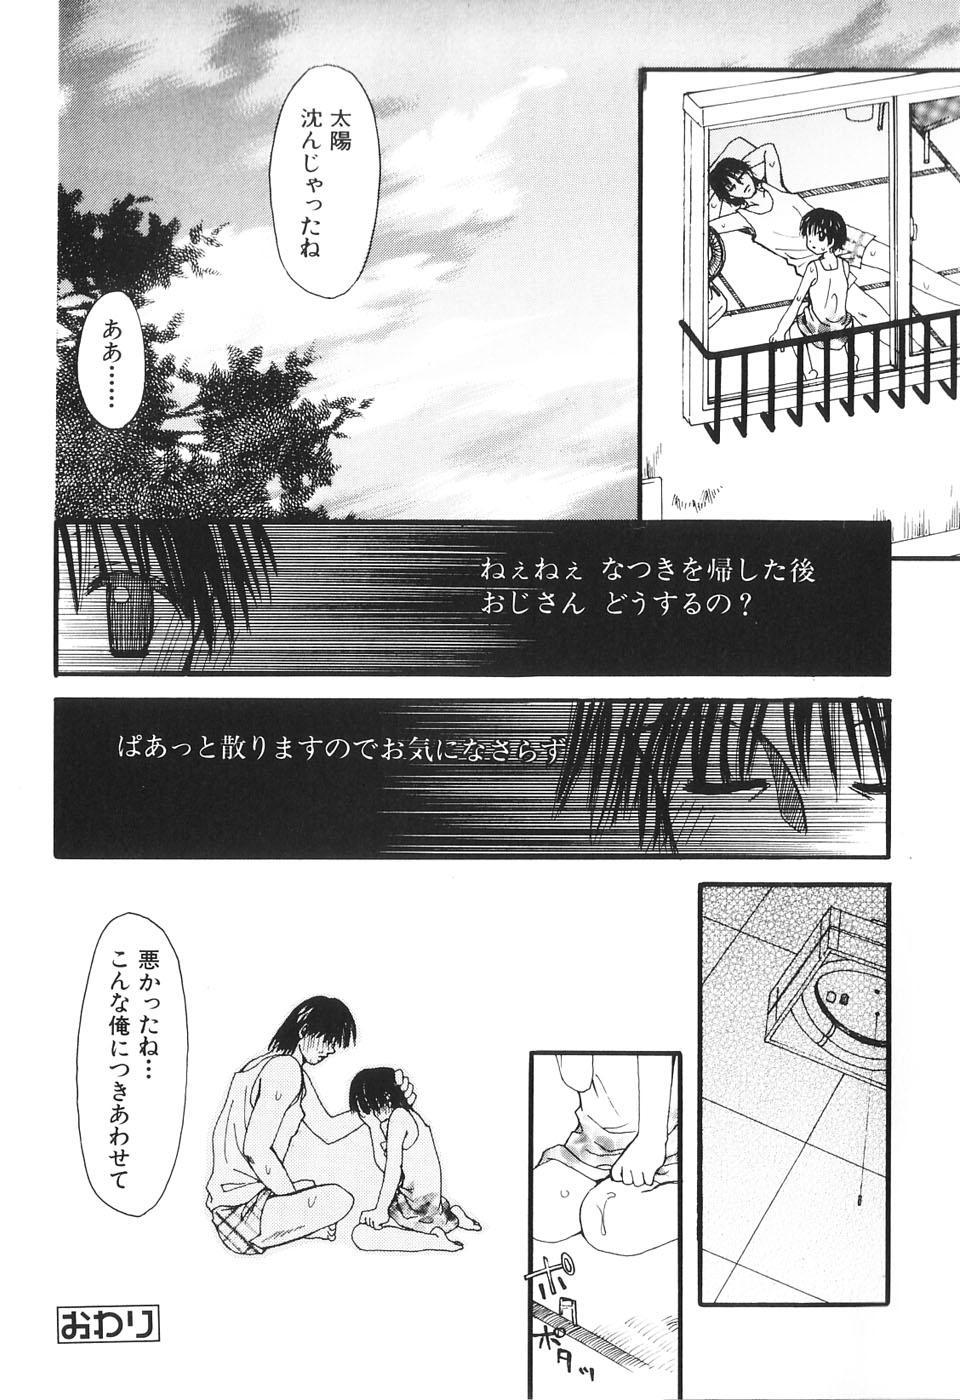 Musoubana 23